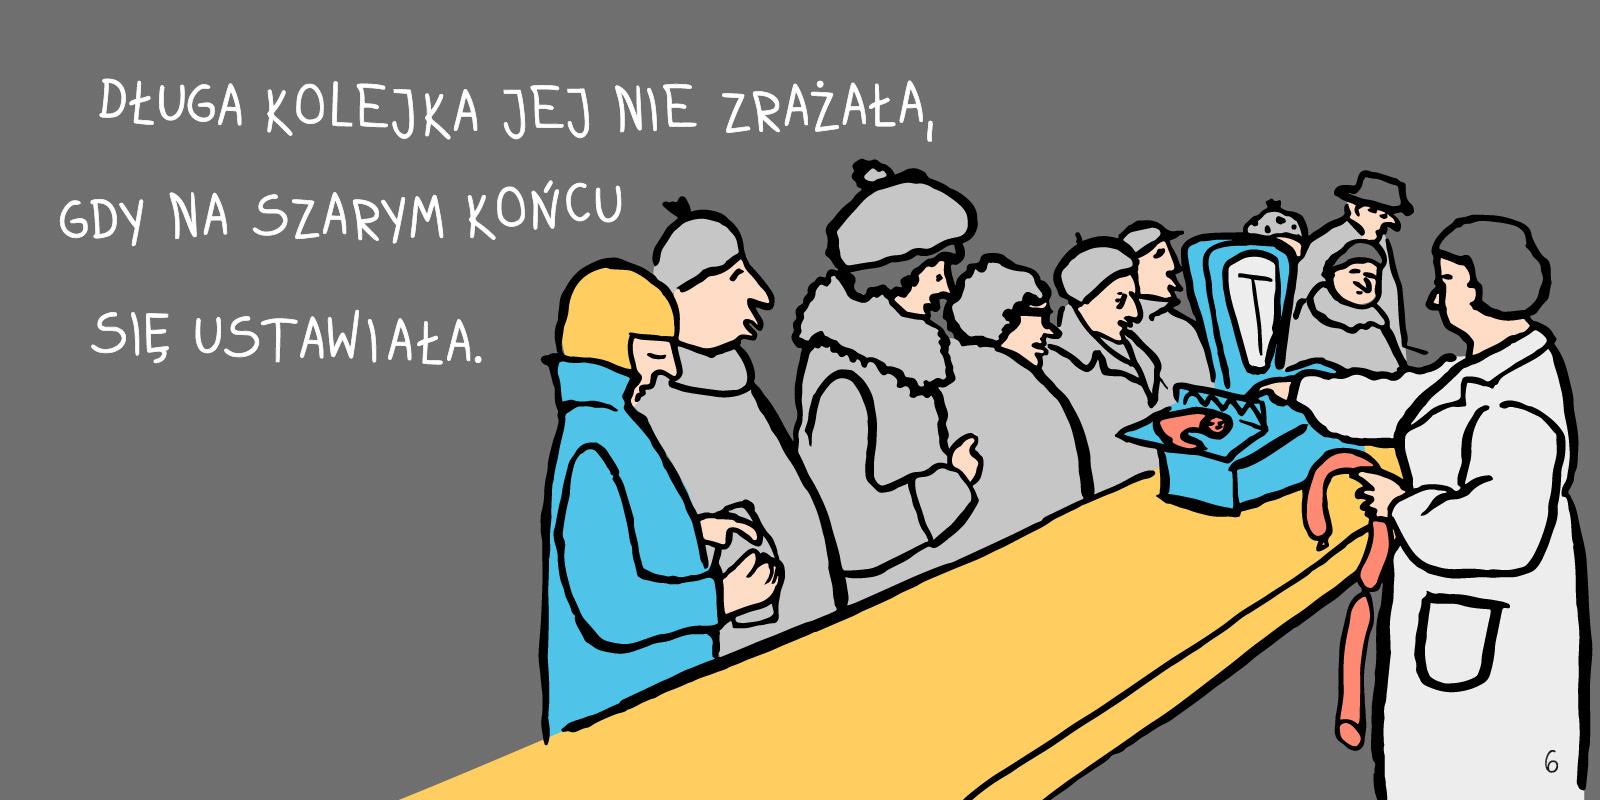 Anonimowa Kiełbasiara On Behance